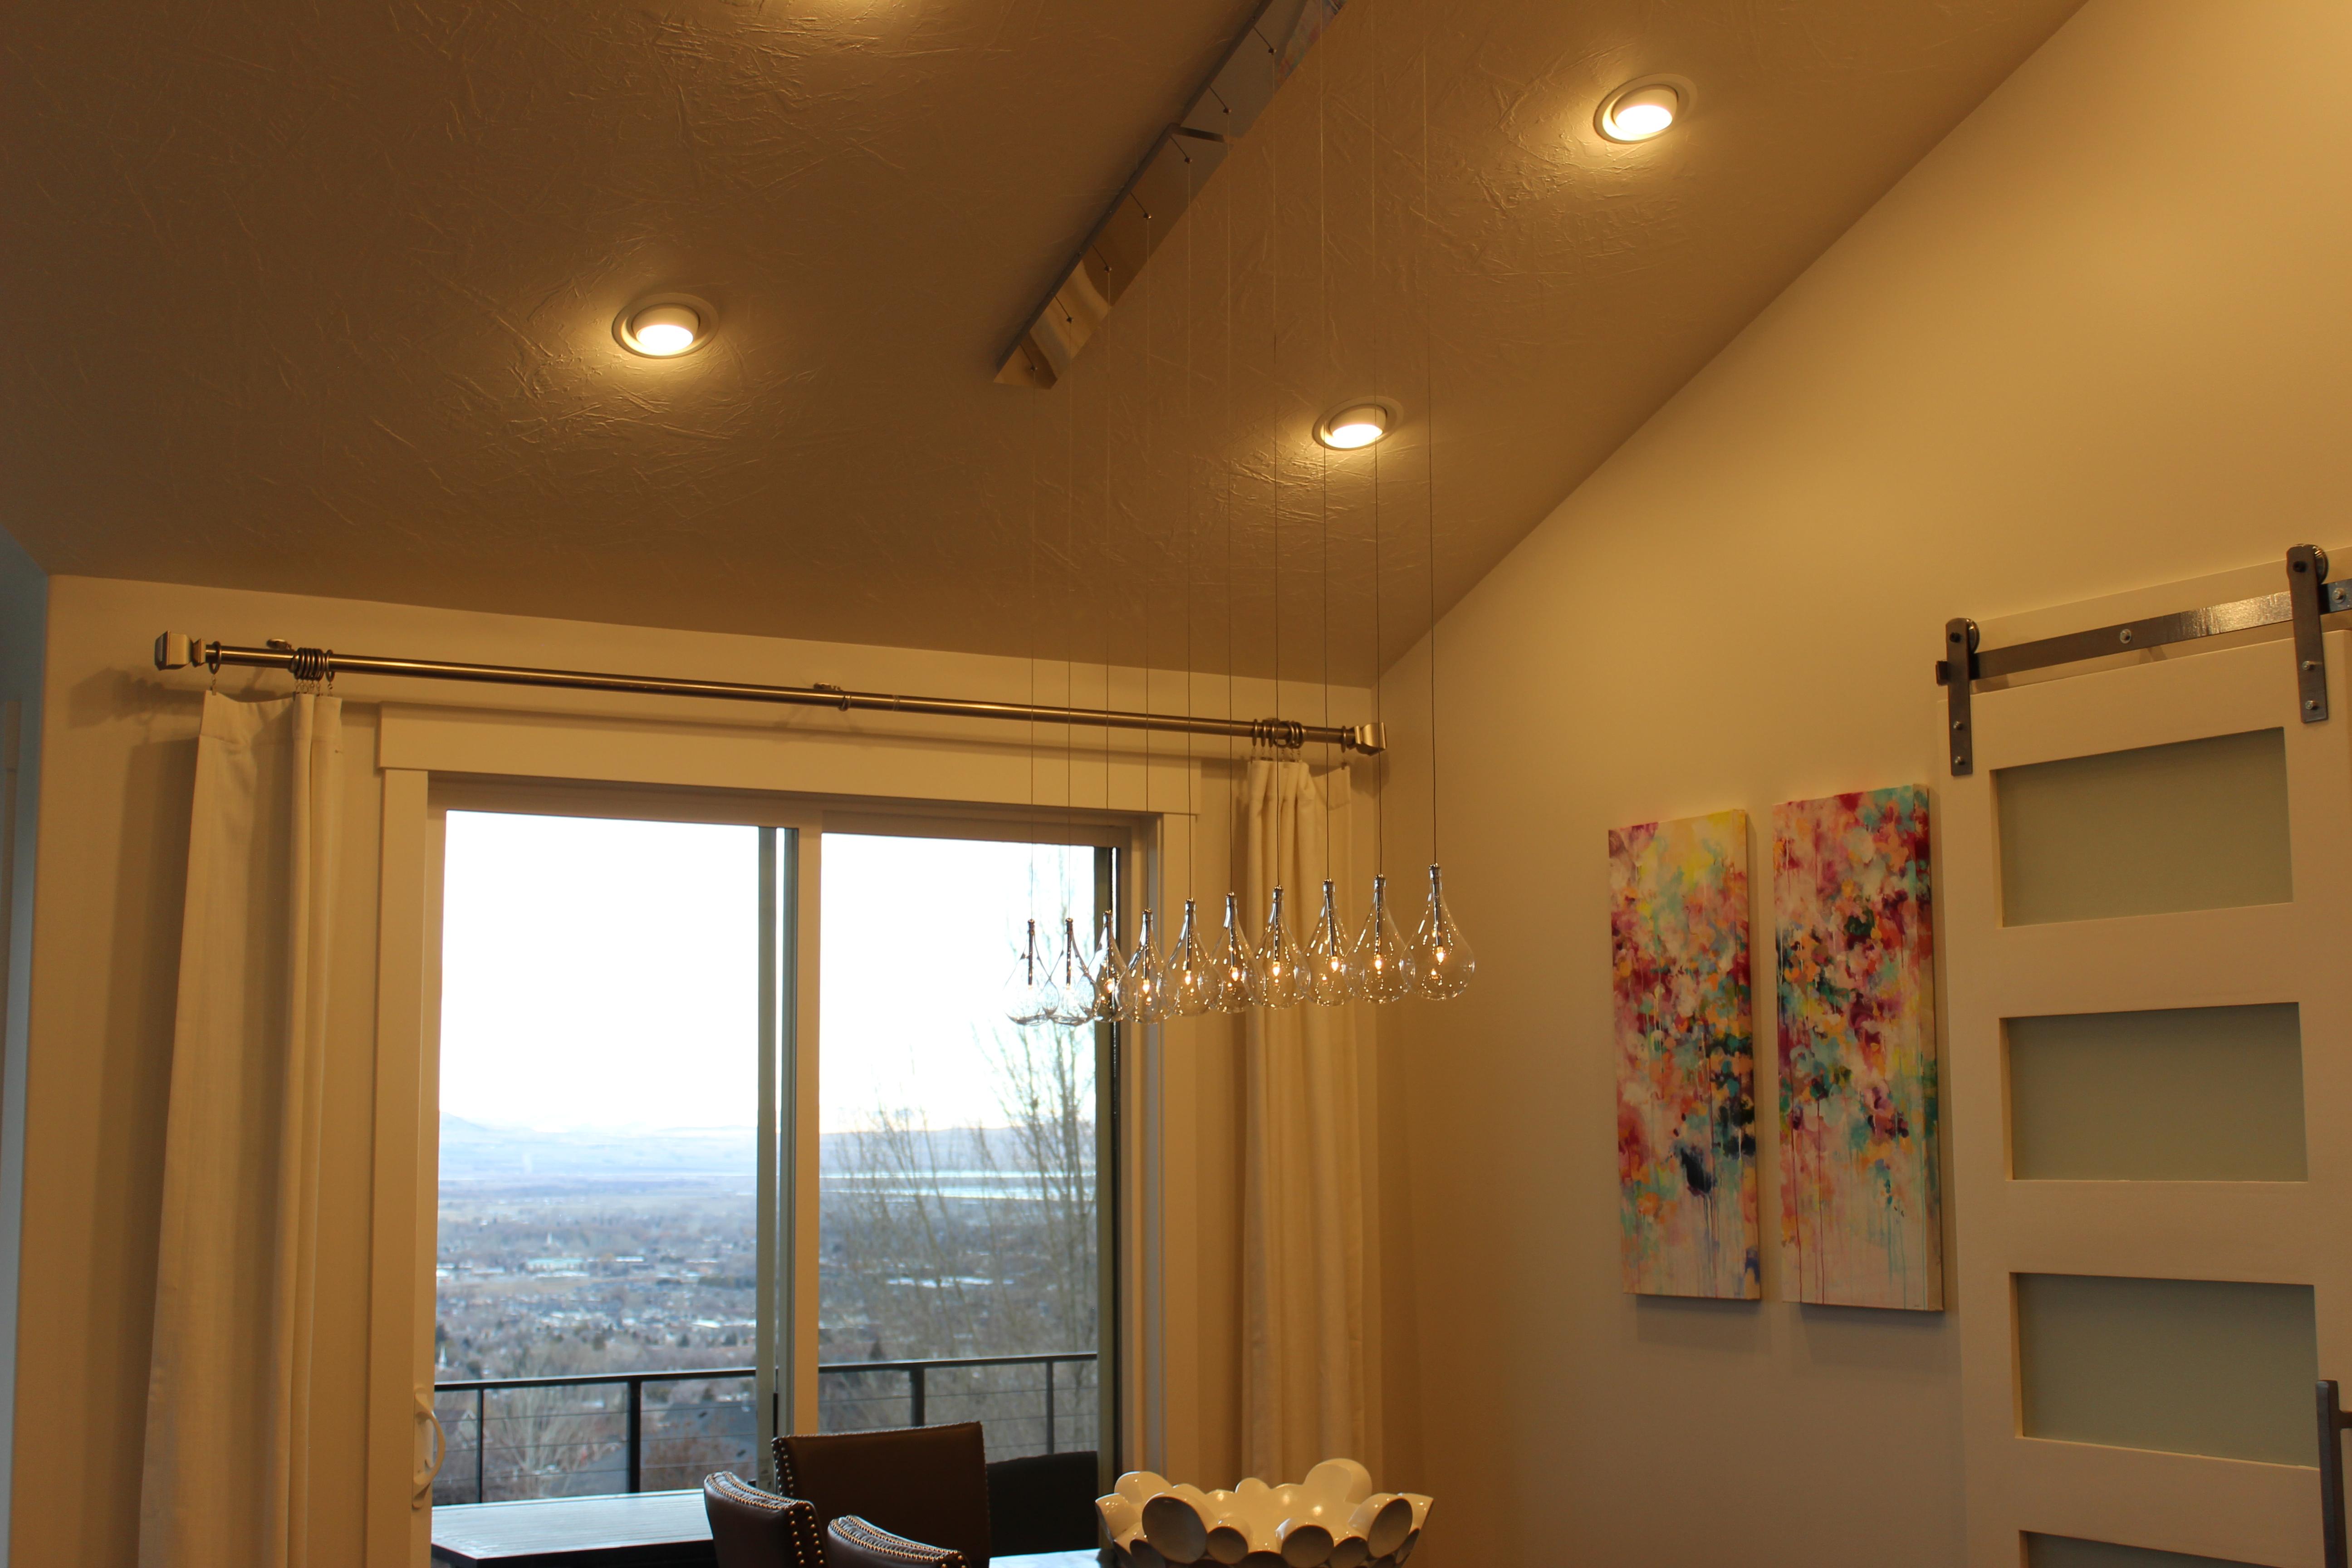 Innovative Lighting & Electrical image 7